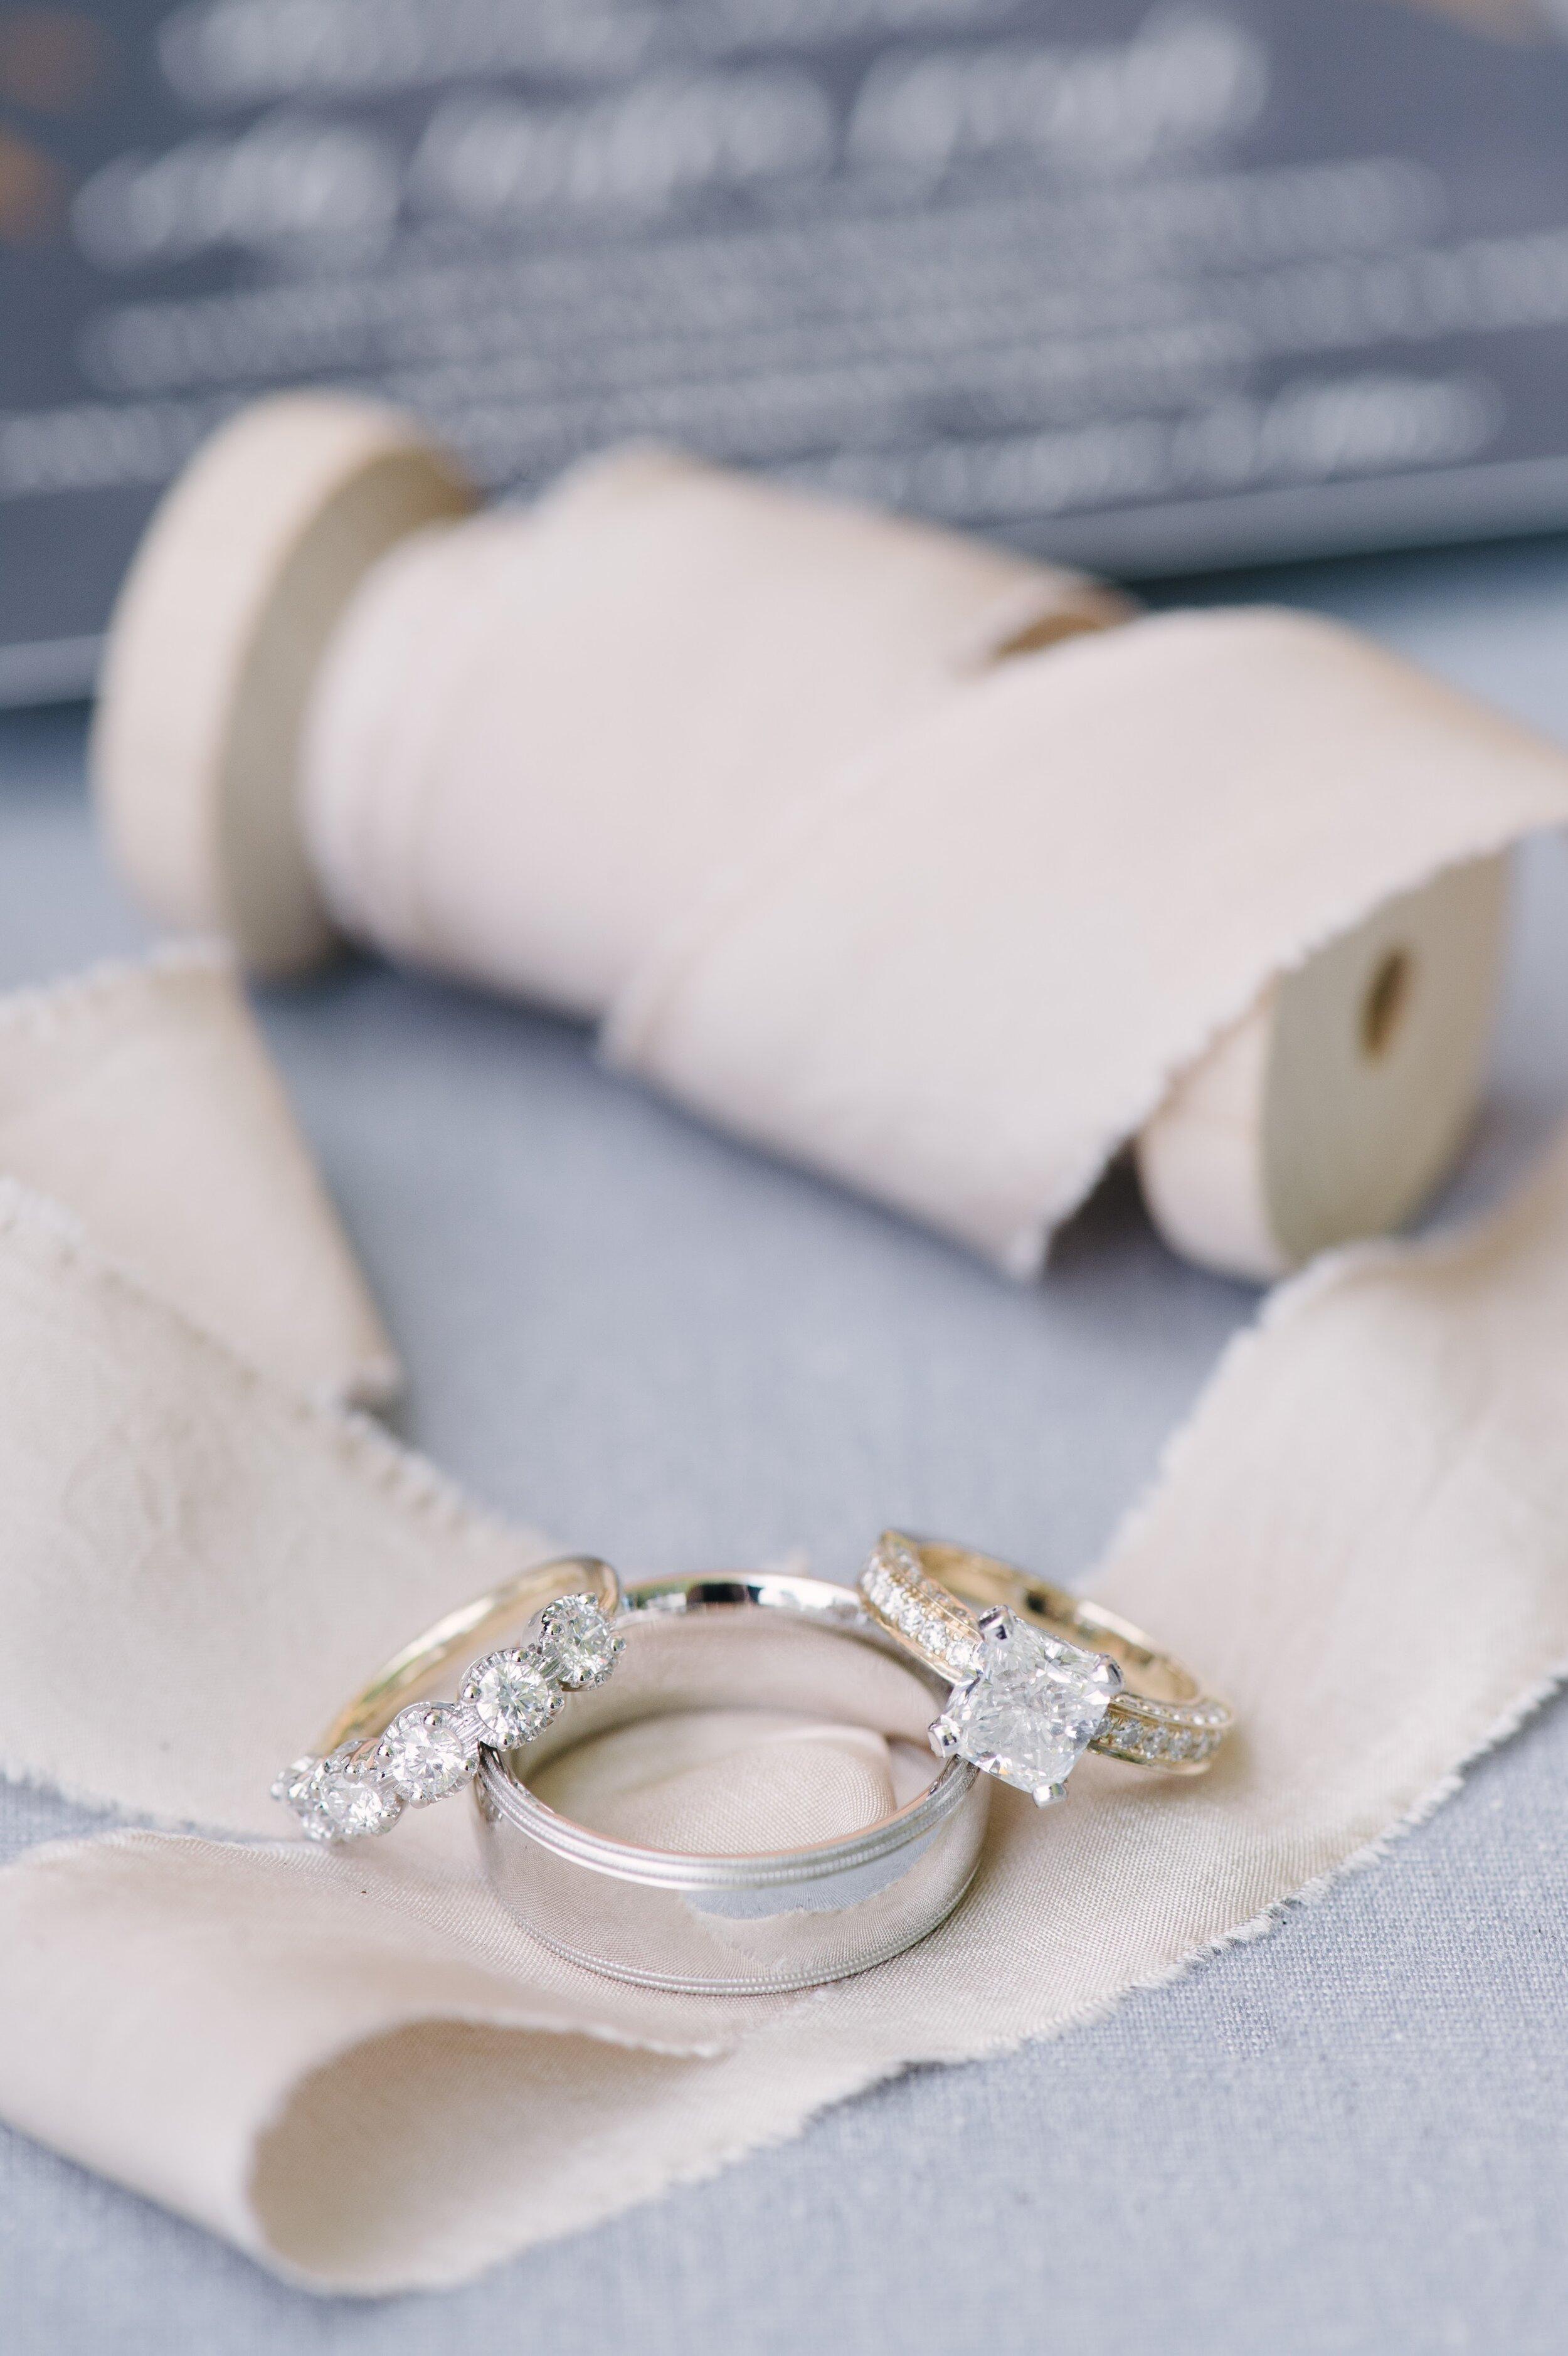 gettingready-wedding-sarah-street-photography-19.jpg